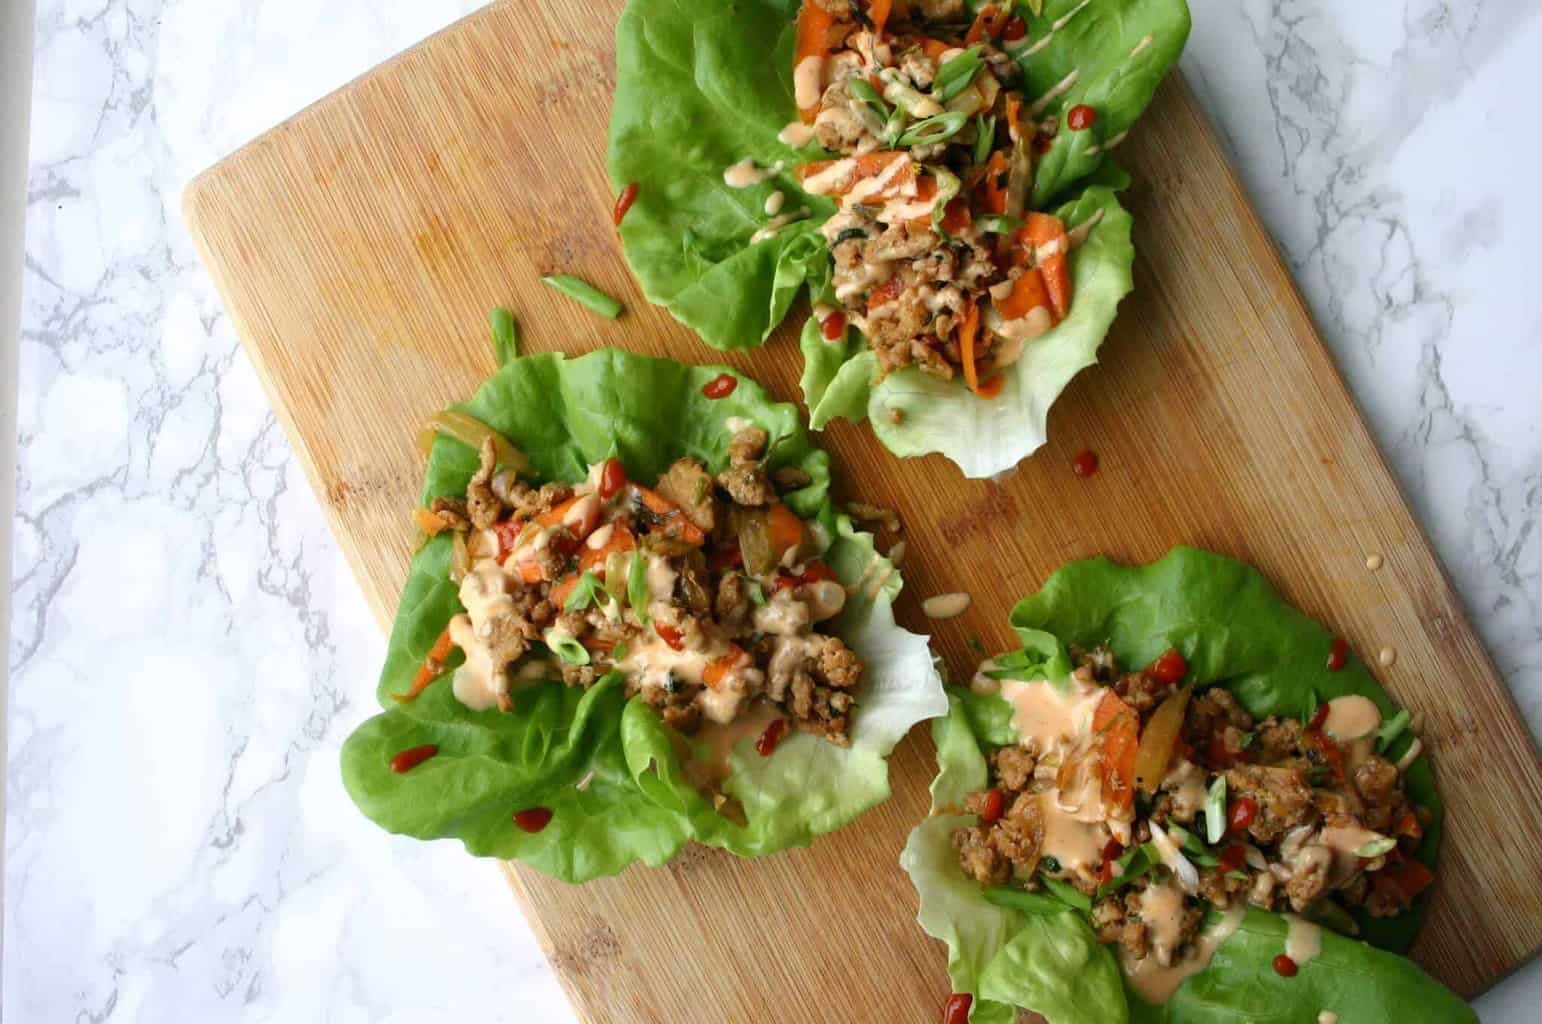 PF Chang's Copycat Lettuce Wraps - Healthy Asian Ground Turkey Lettuce Wraps!